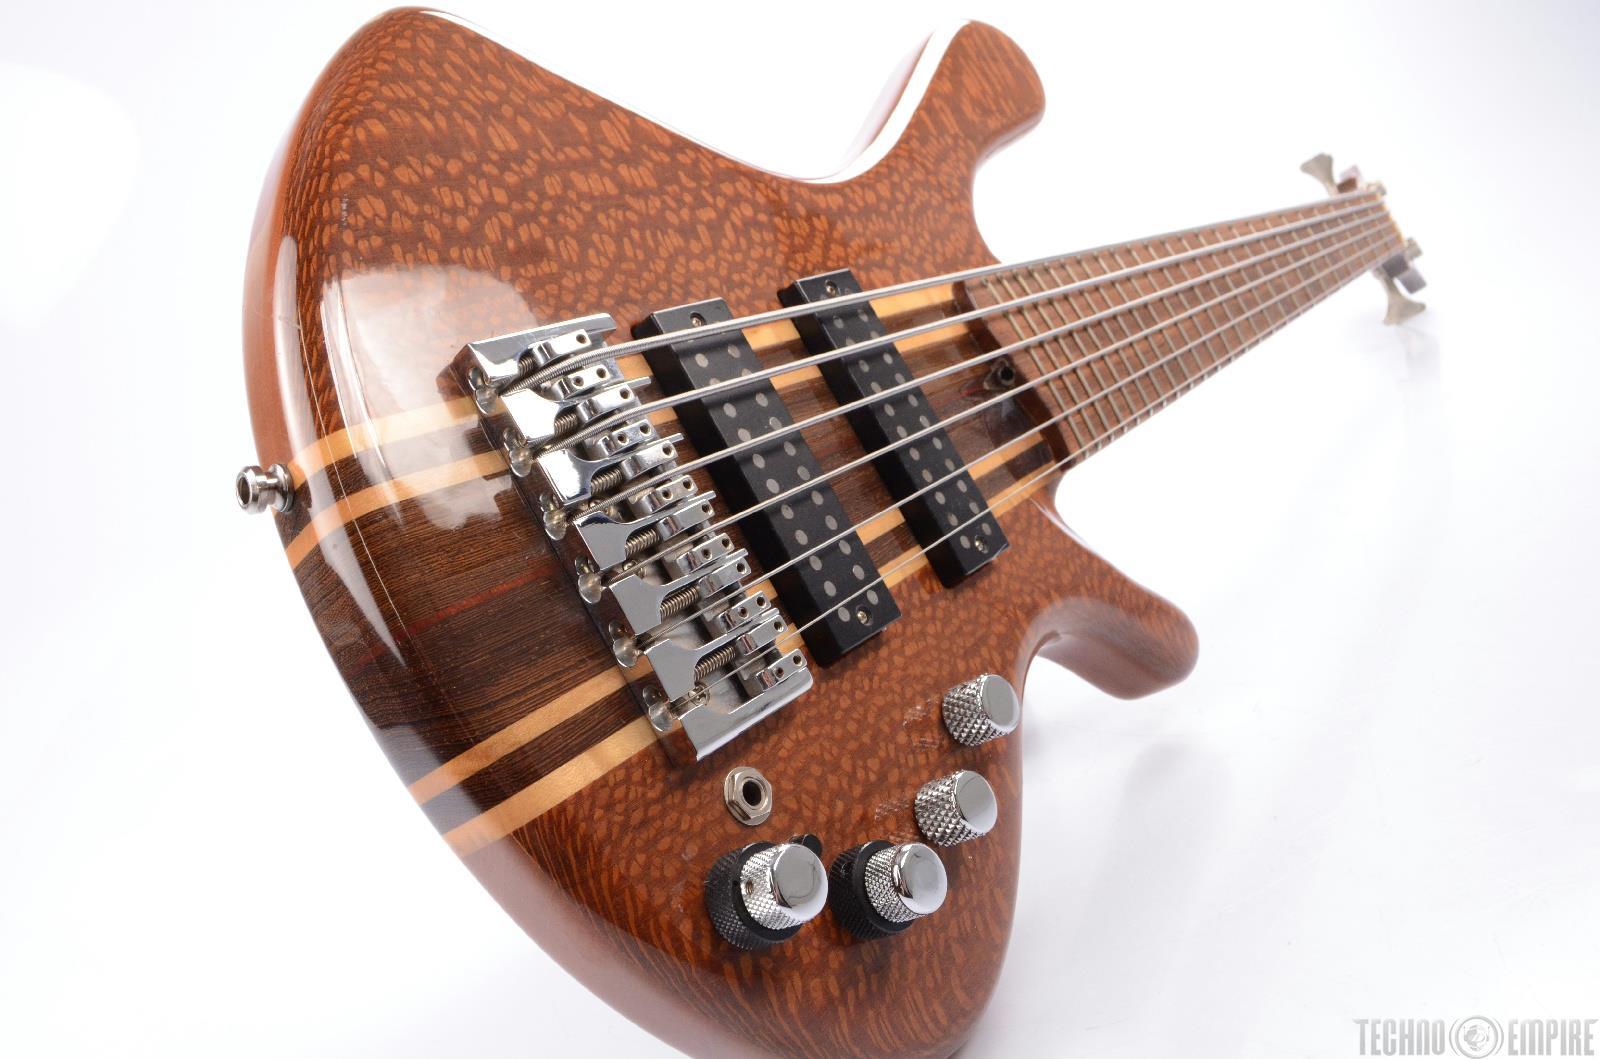 fender custom shop tye zamora oar 6 string bass guitar alien ant farm 21142 ebay. Black Bedroom Furniture Sets. Home Design Ideas